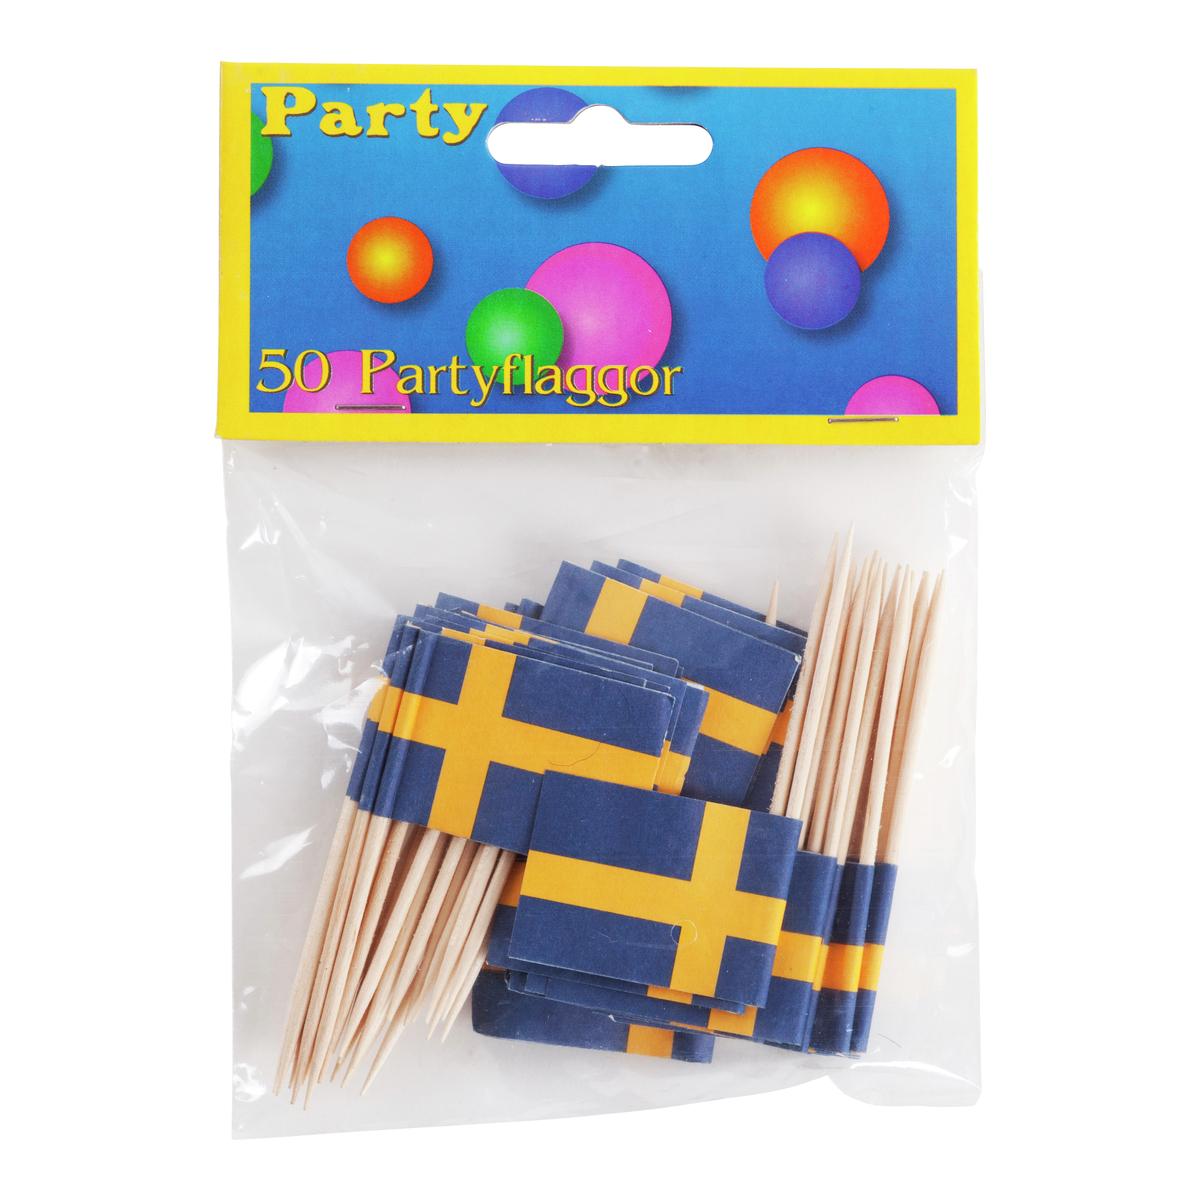 Partyflaggor 50-pack